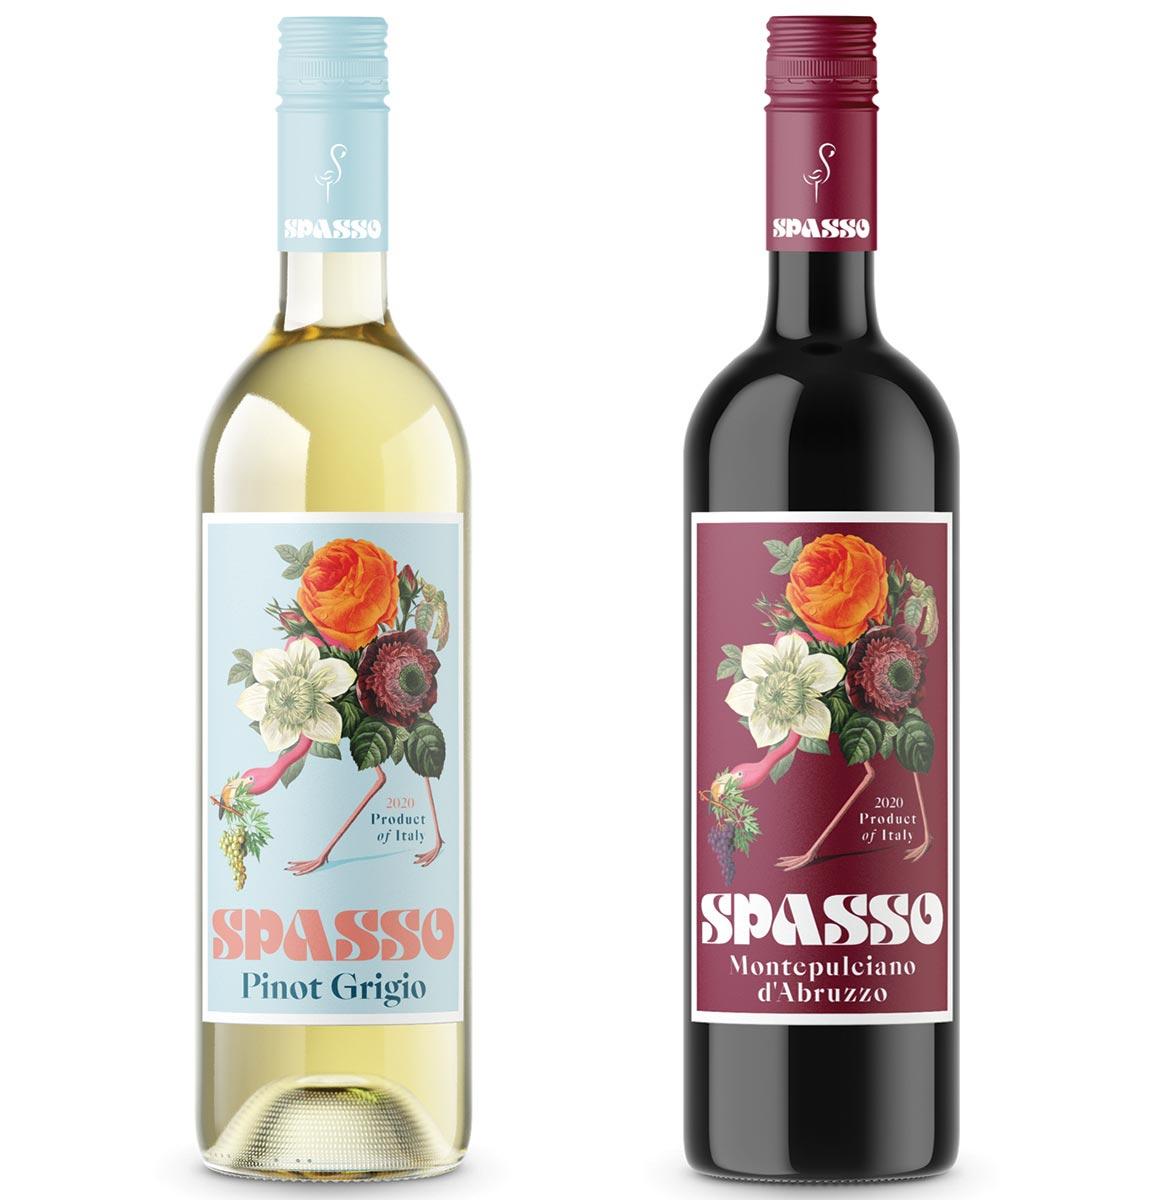 MS Walker Portfolio Wines Showcase New Looks